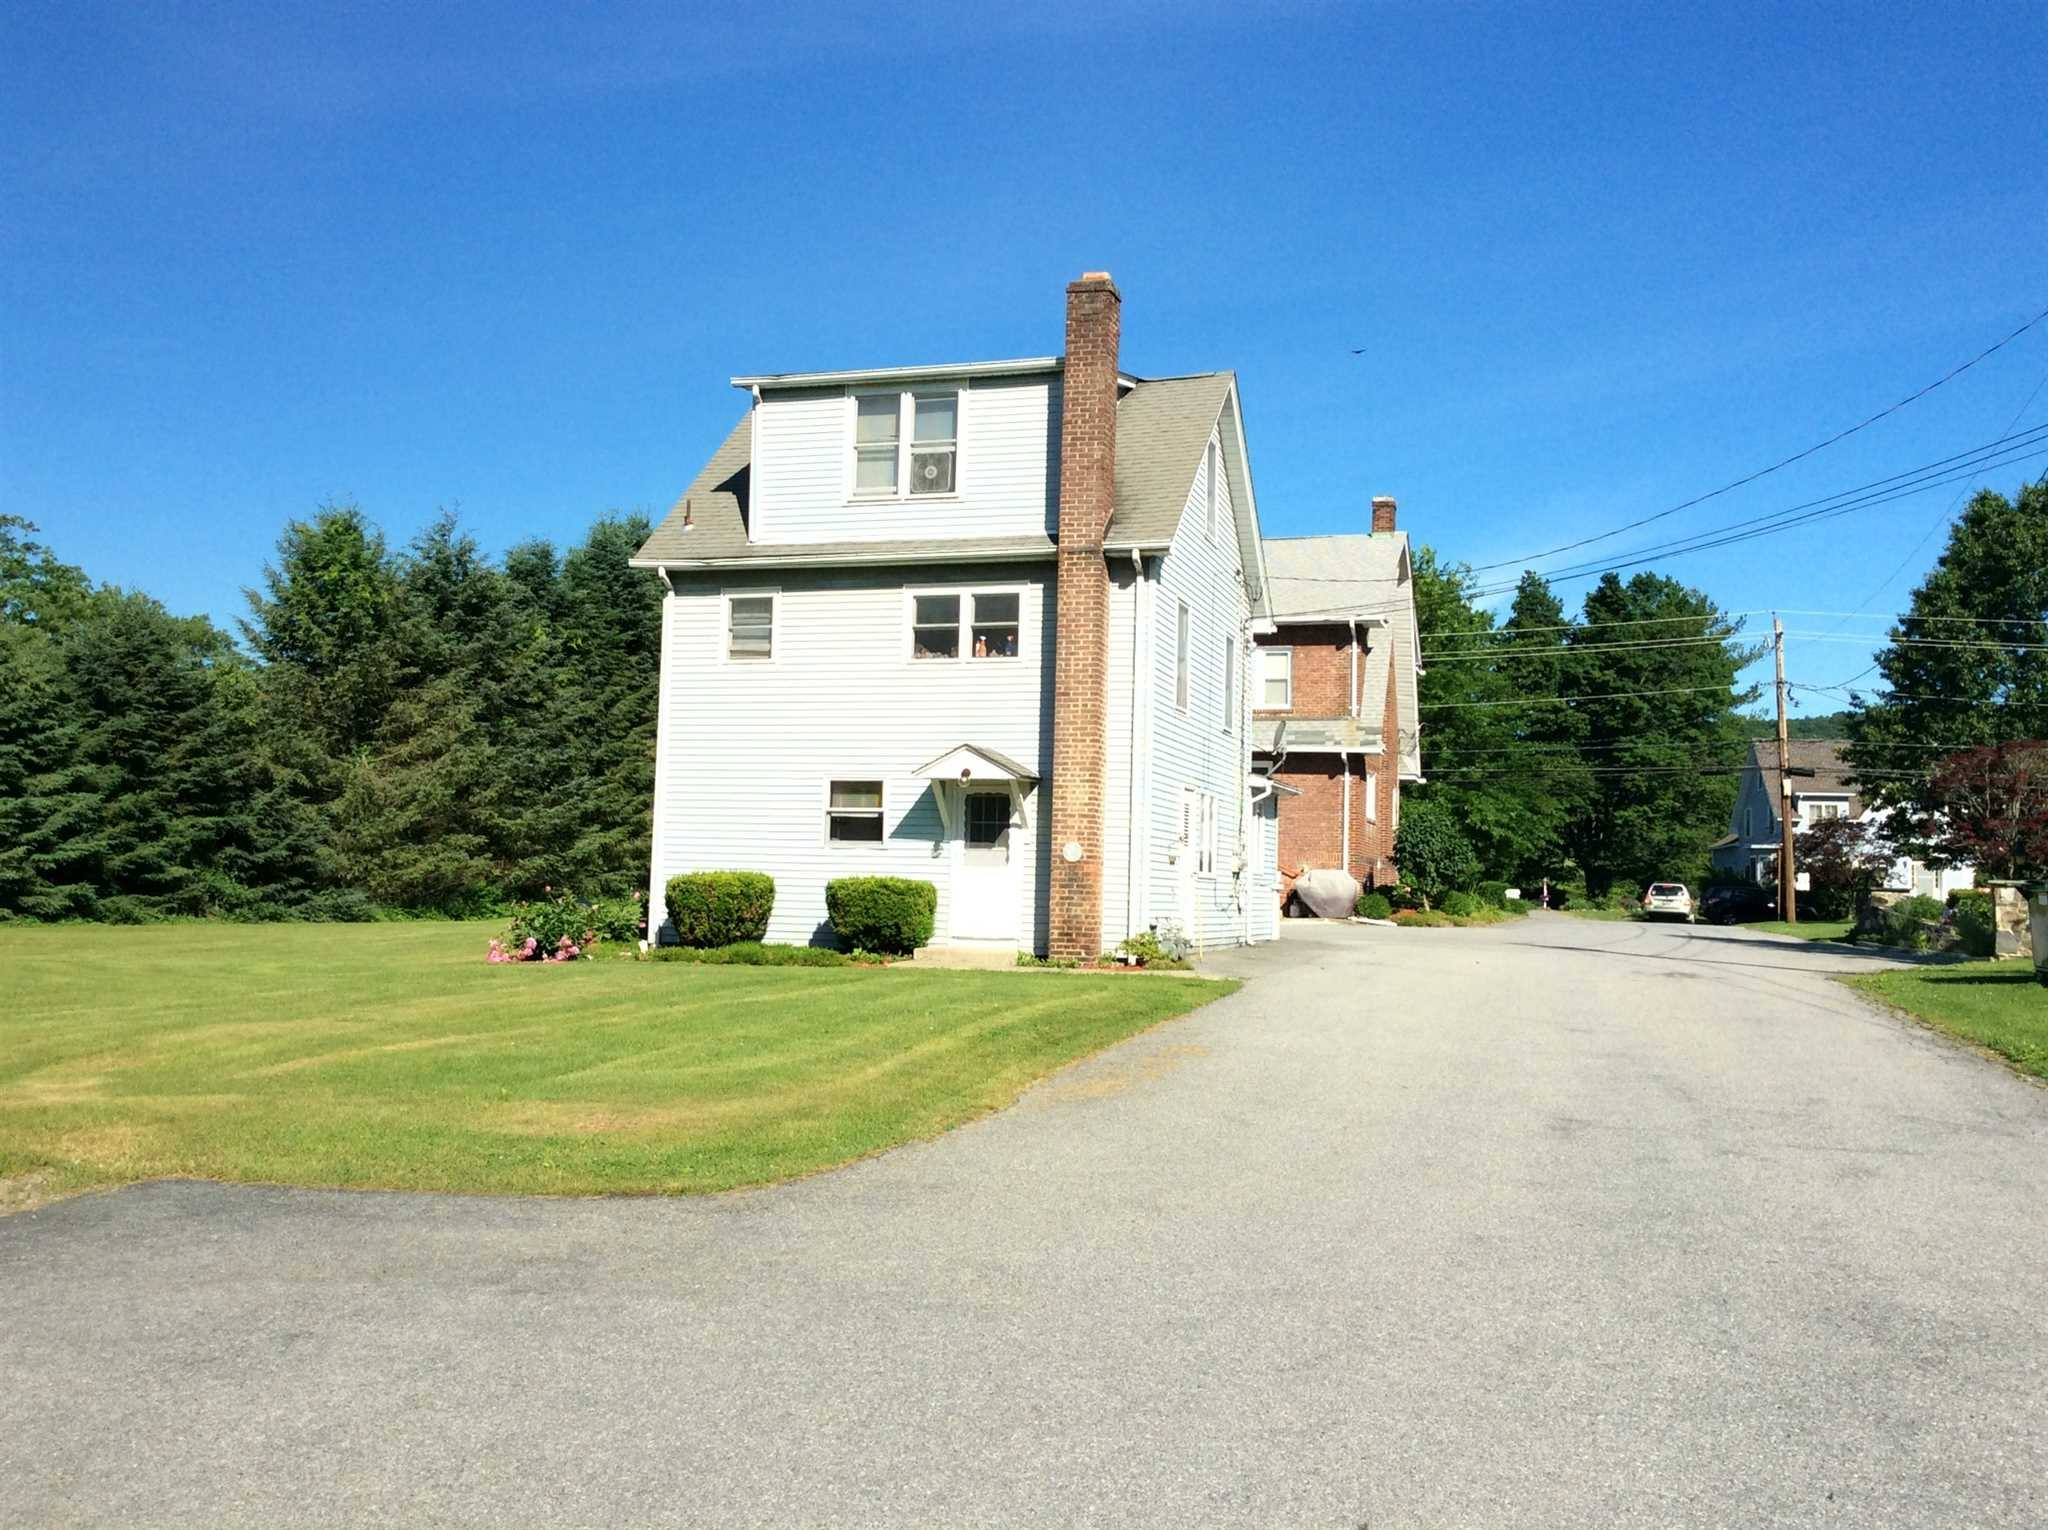 Single Family Home for Rent at 252 VINEYARD AVENUE 252 VINEYARD AVENUE Lloyd, New York 12528 United States